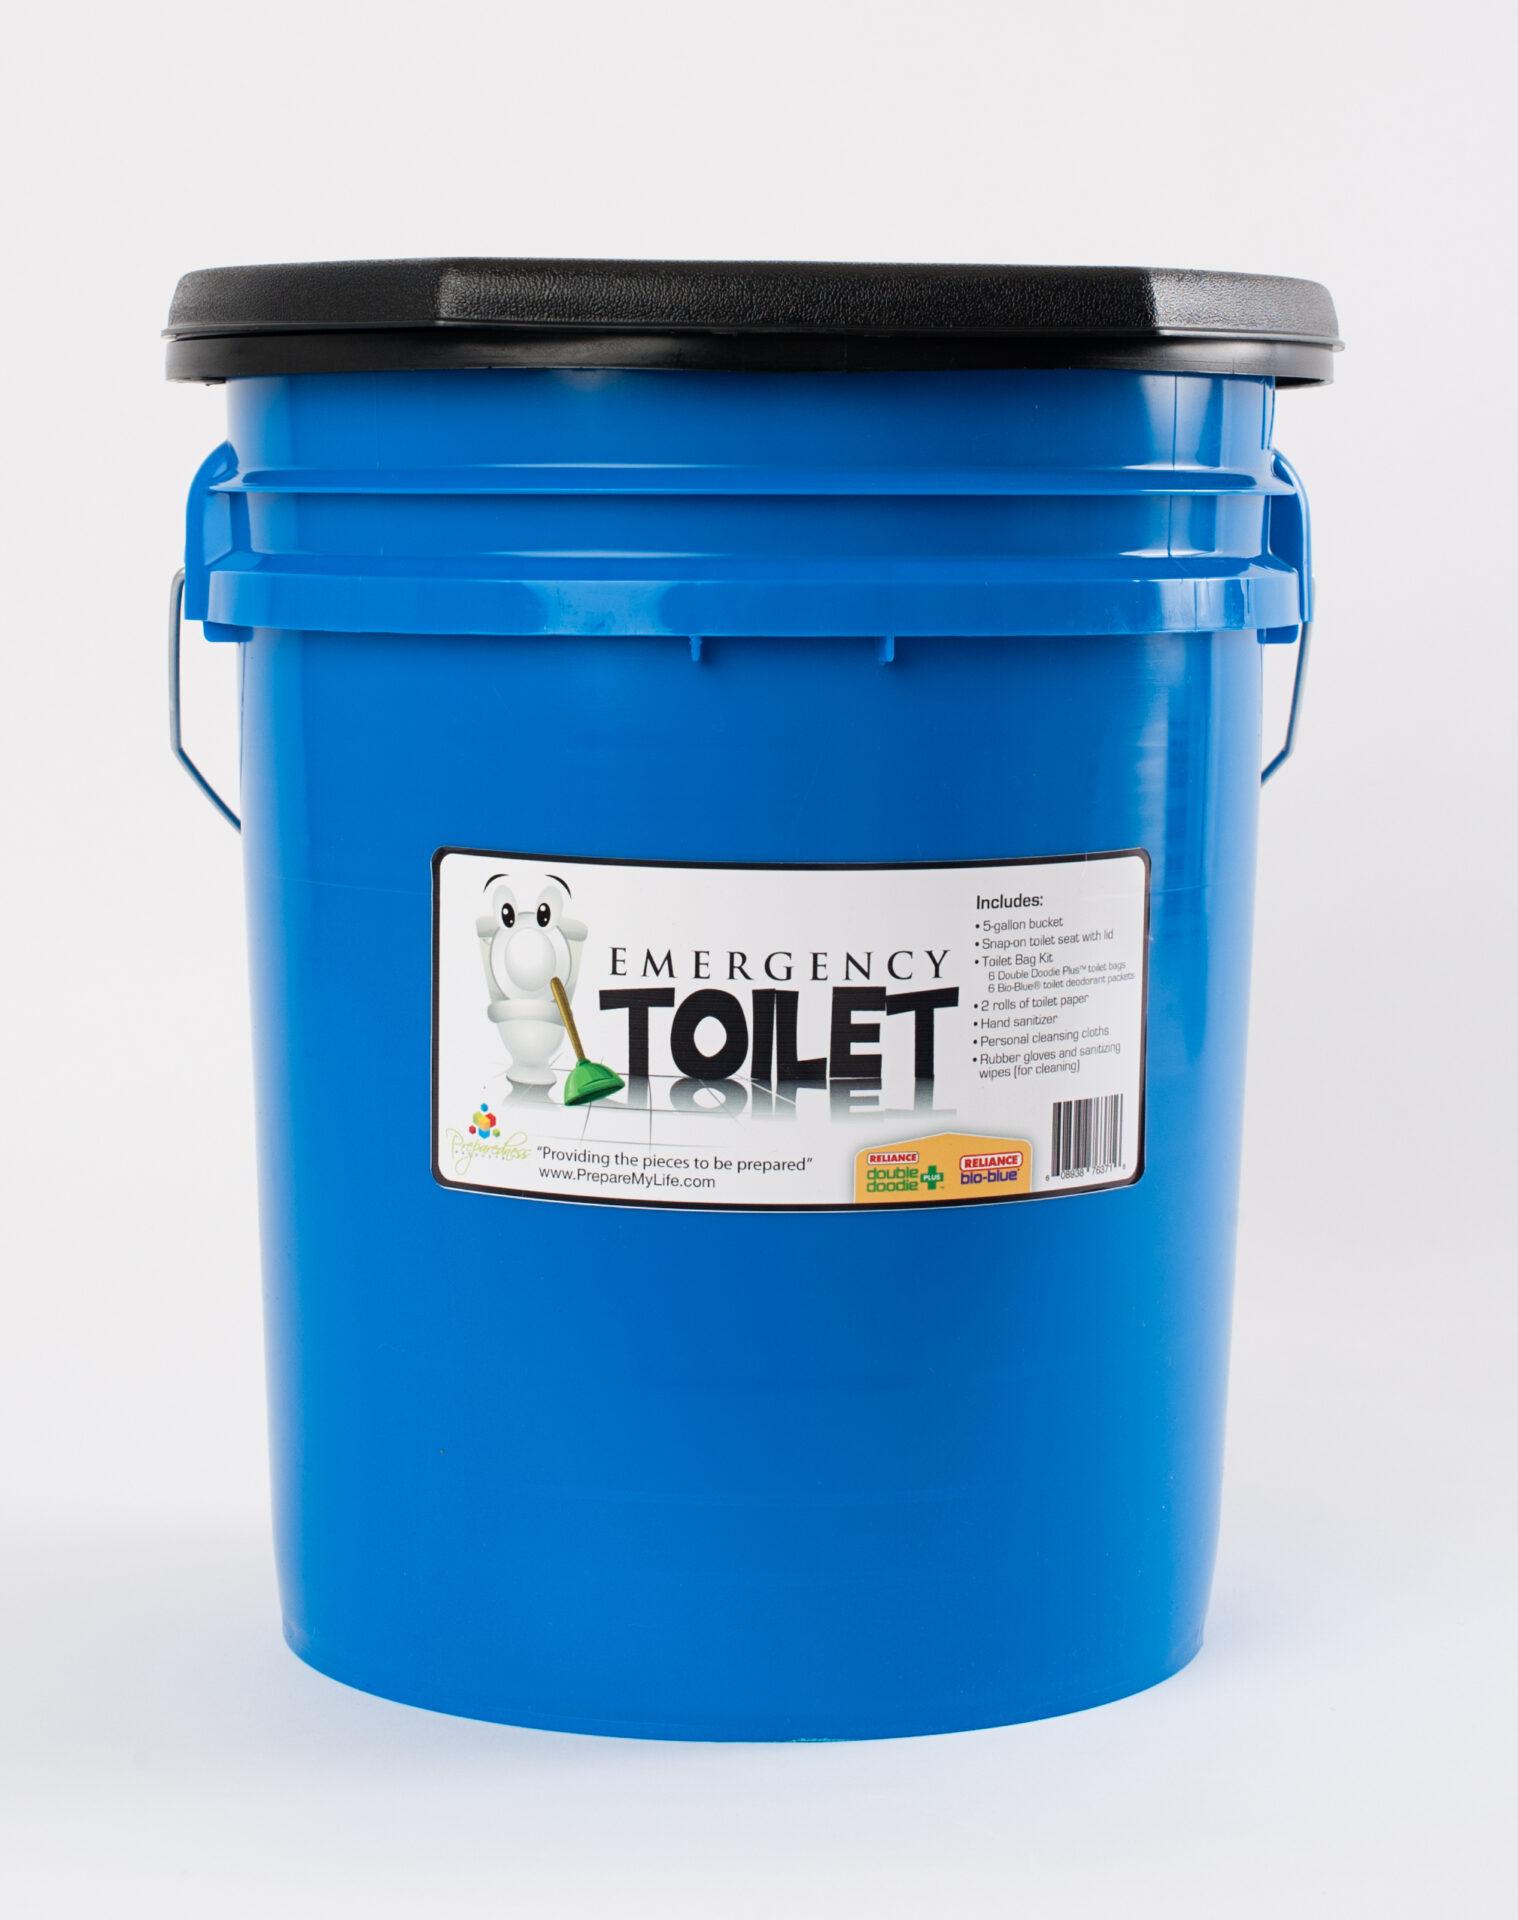 Prepare My Life Complete Emergency Toilet